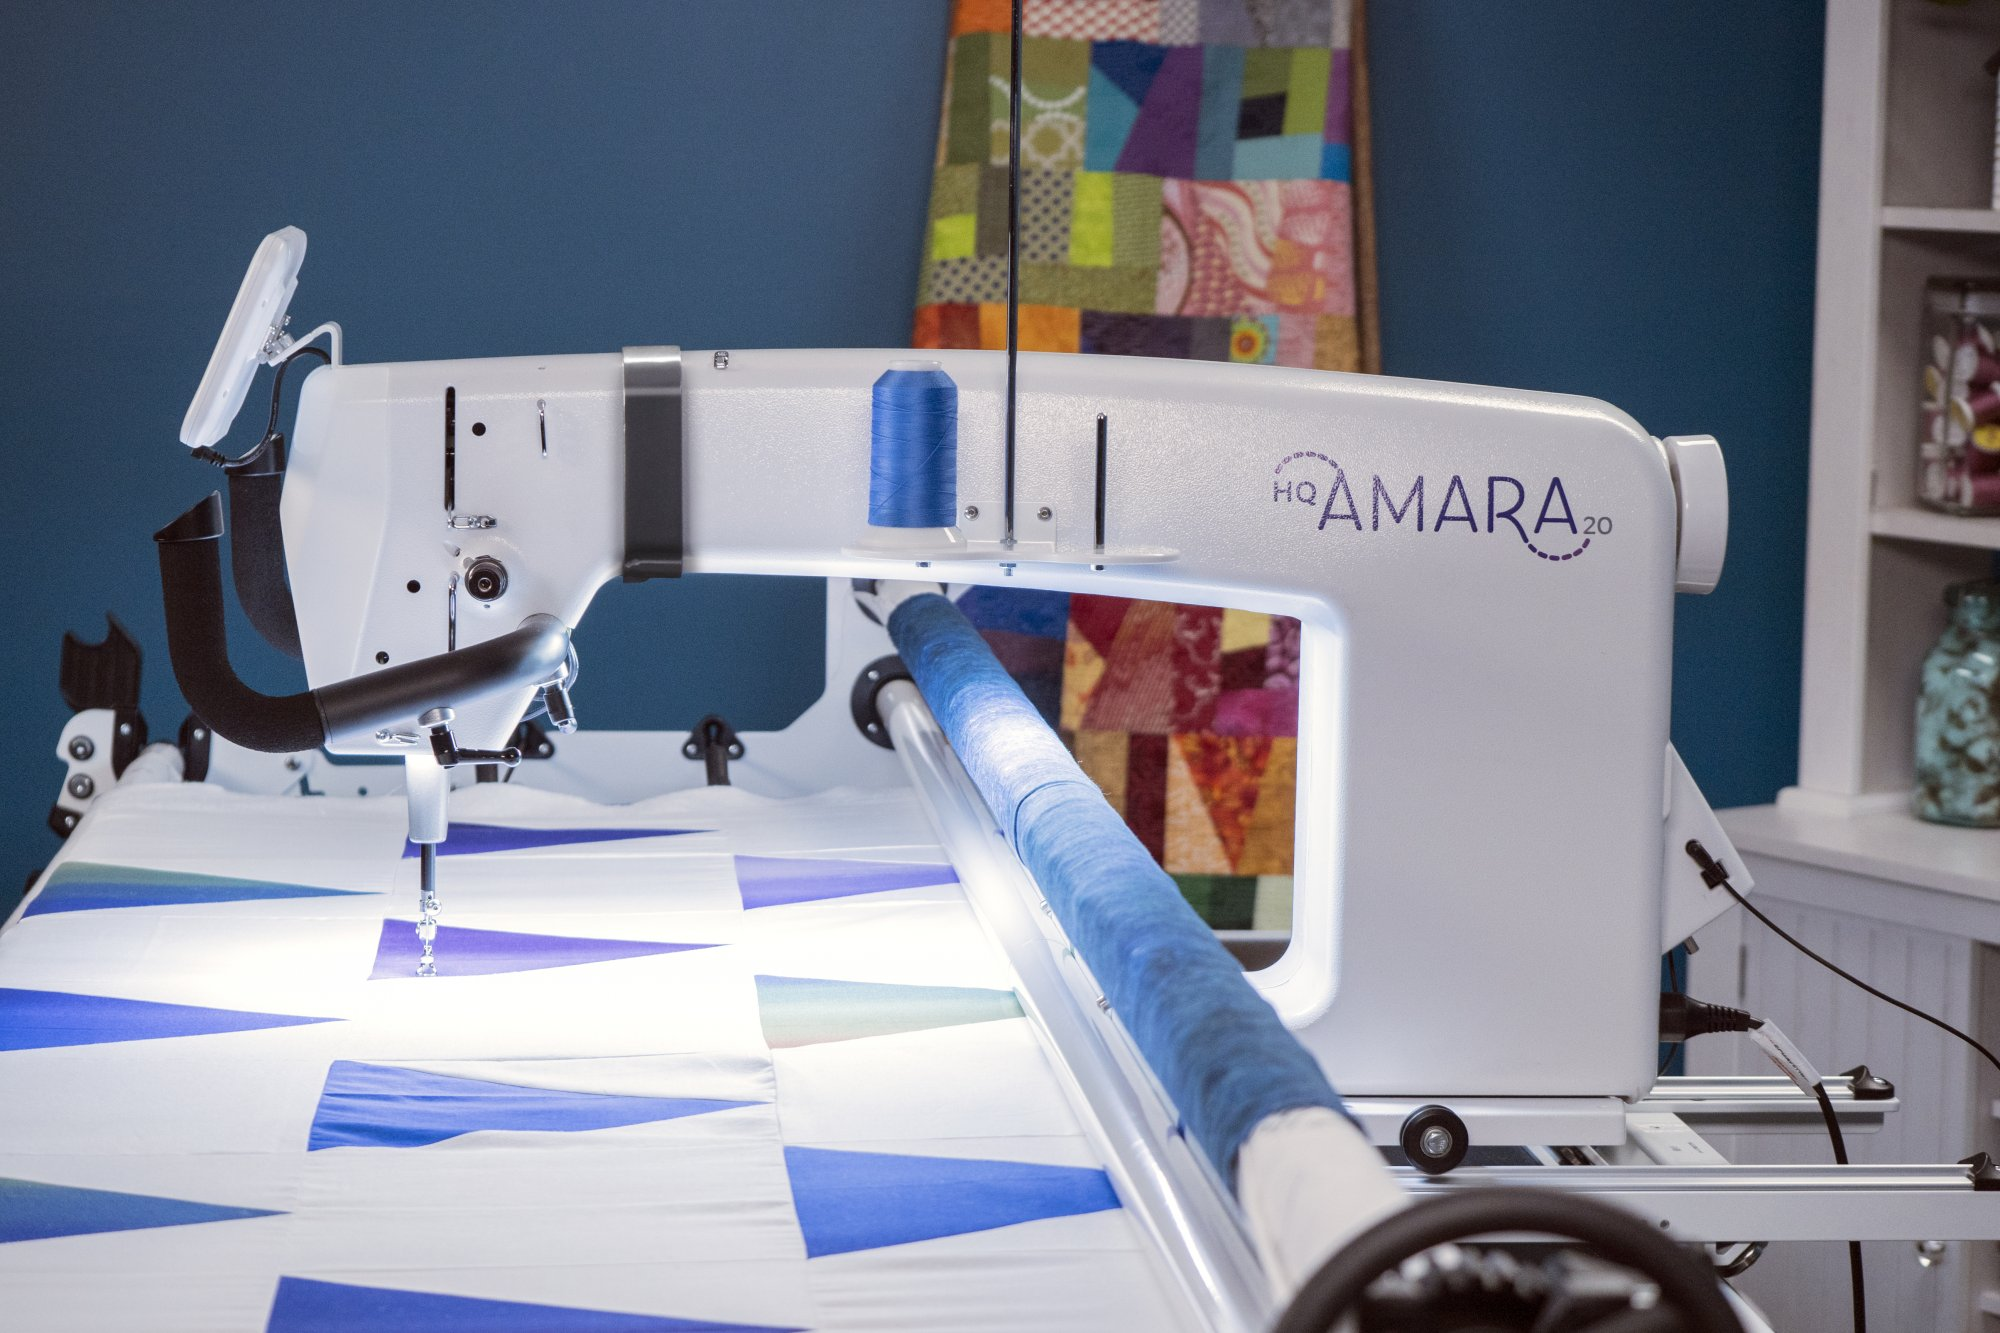 Amara w/ Pro-stitcher and Prostitcher Design on 12 foot frame